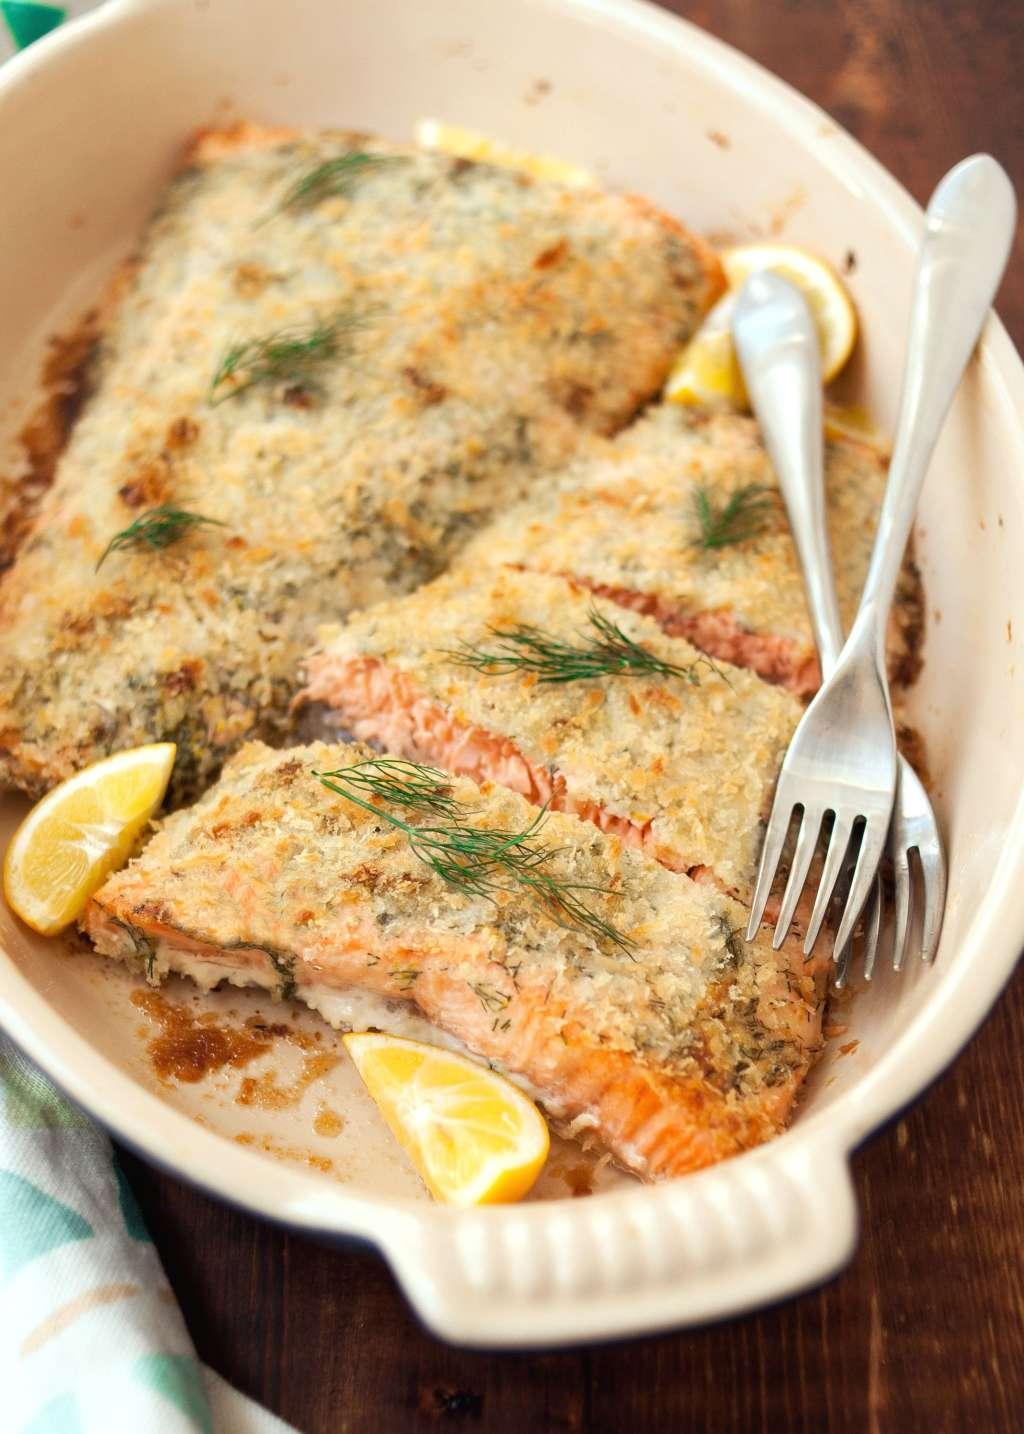 Recipe: Panko-Crusted Salmon with Dill & Lemon